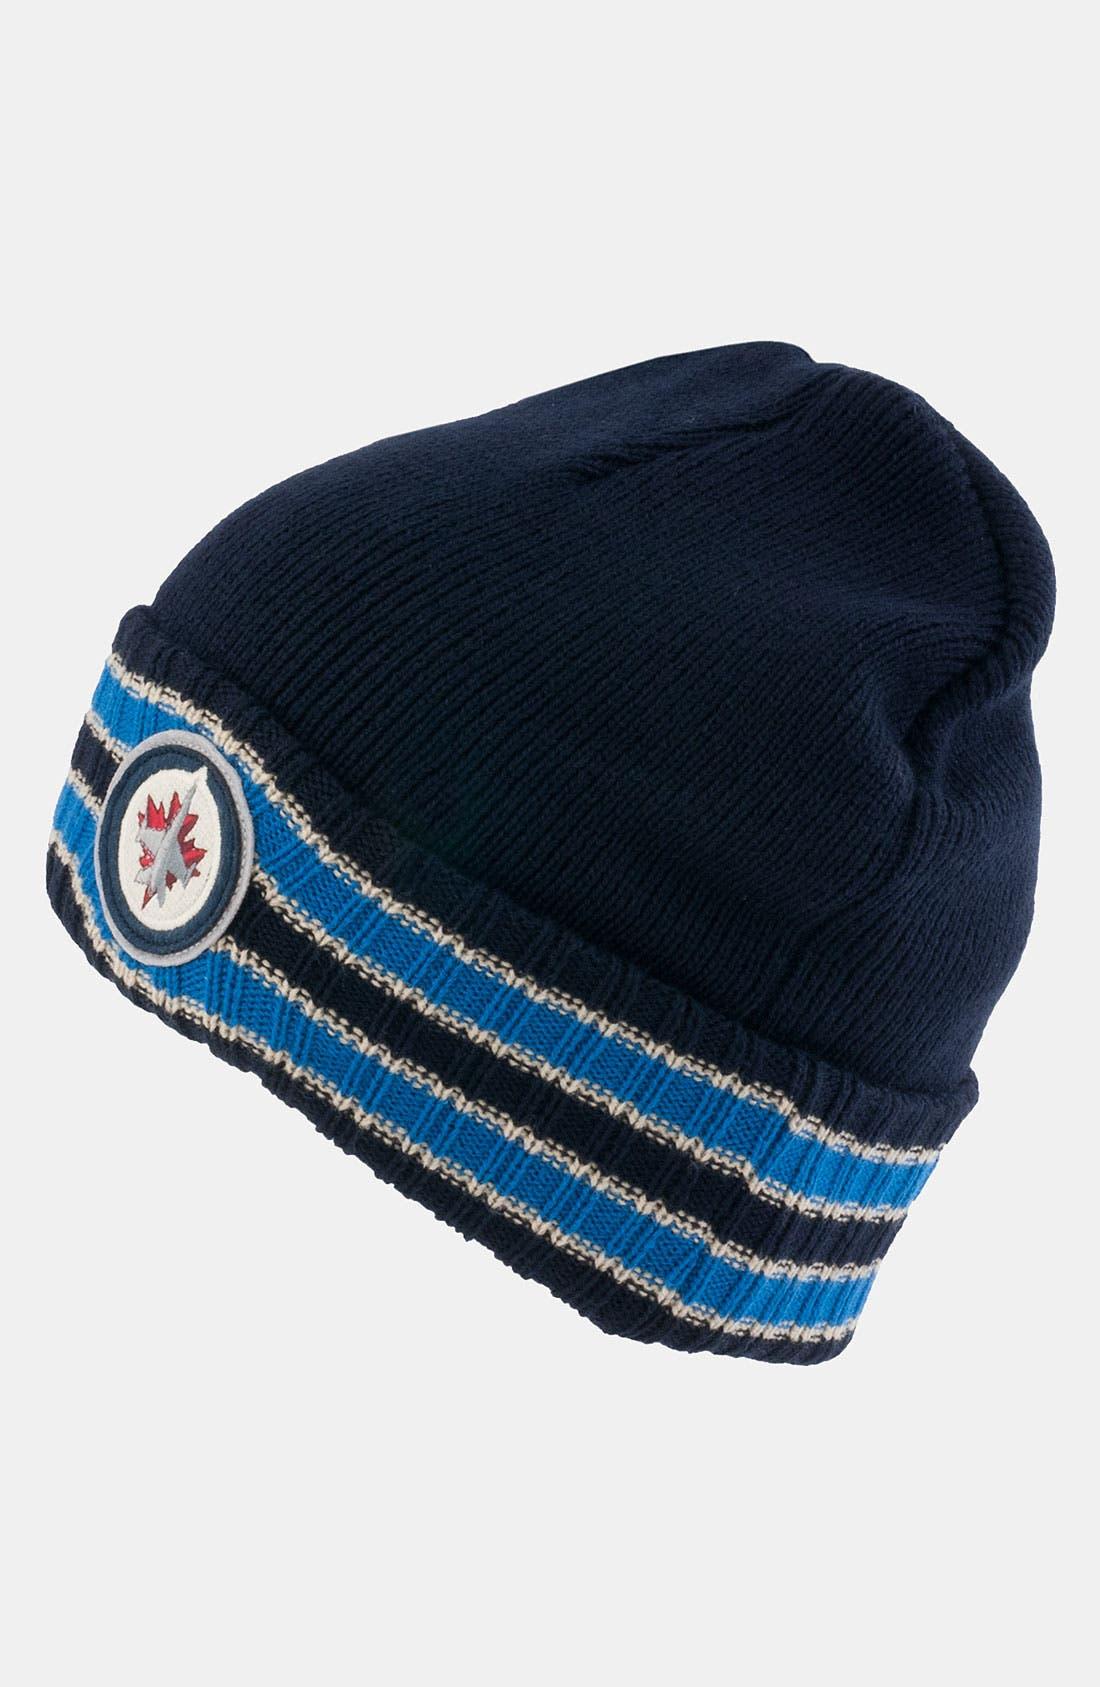 Alternate Image 1 Selected - American Needle 'Winnepeg Jets - Slash' Knit Hat